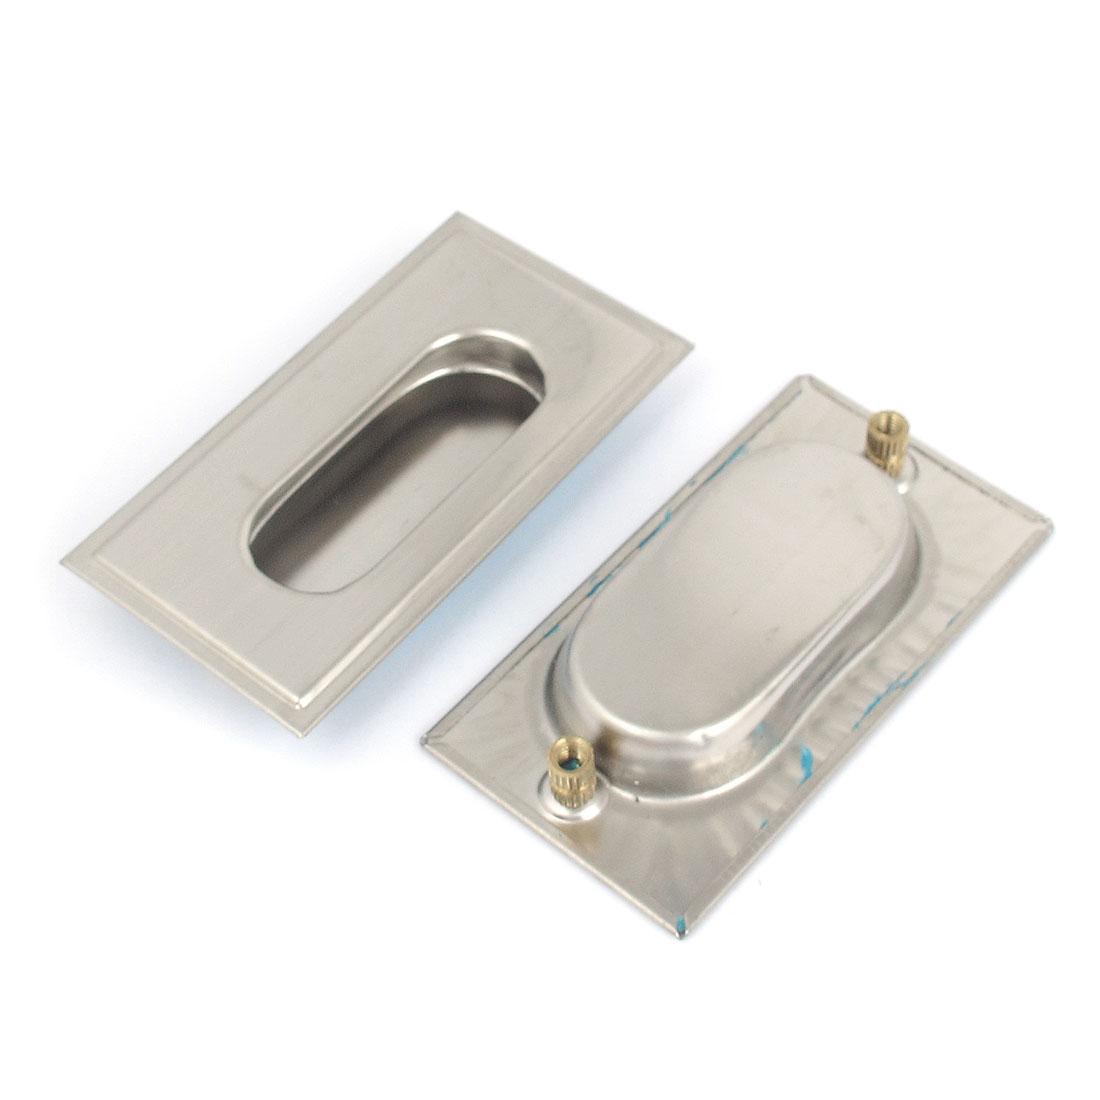 2pcs Zinc Alloy Rectangle Drawer Door Flush Recessed Pull Handle 78mm x 42mm